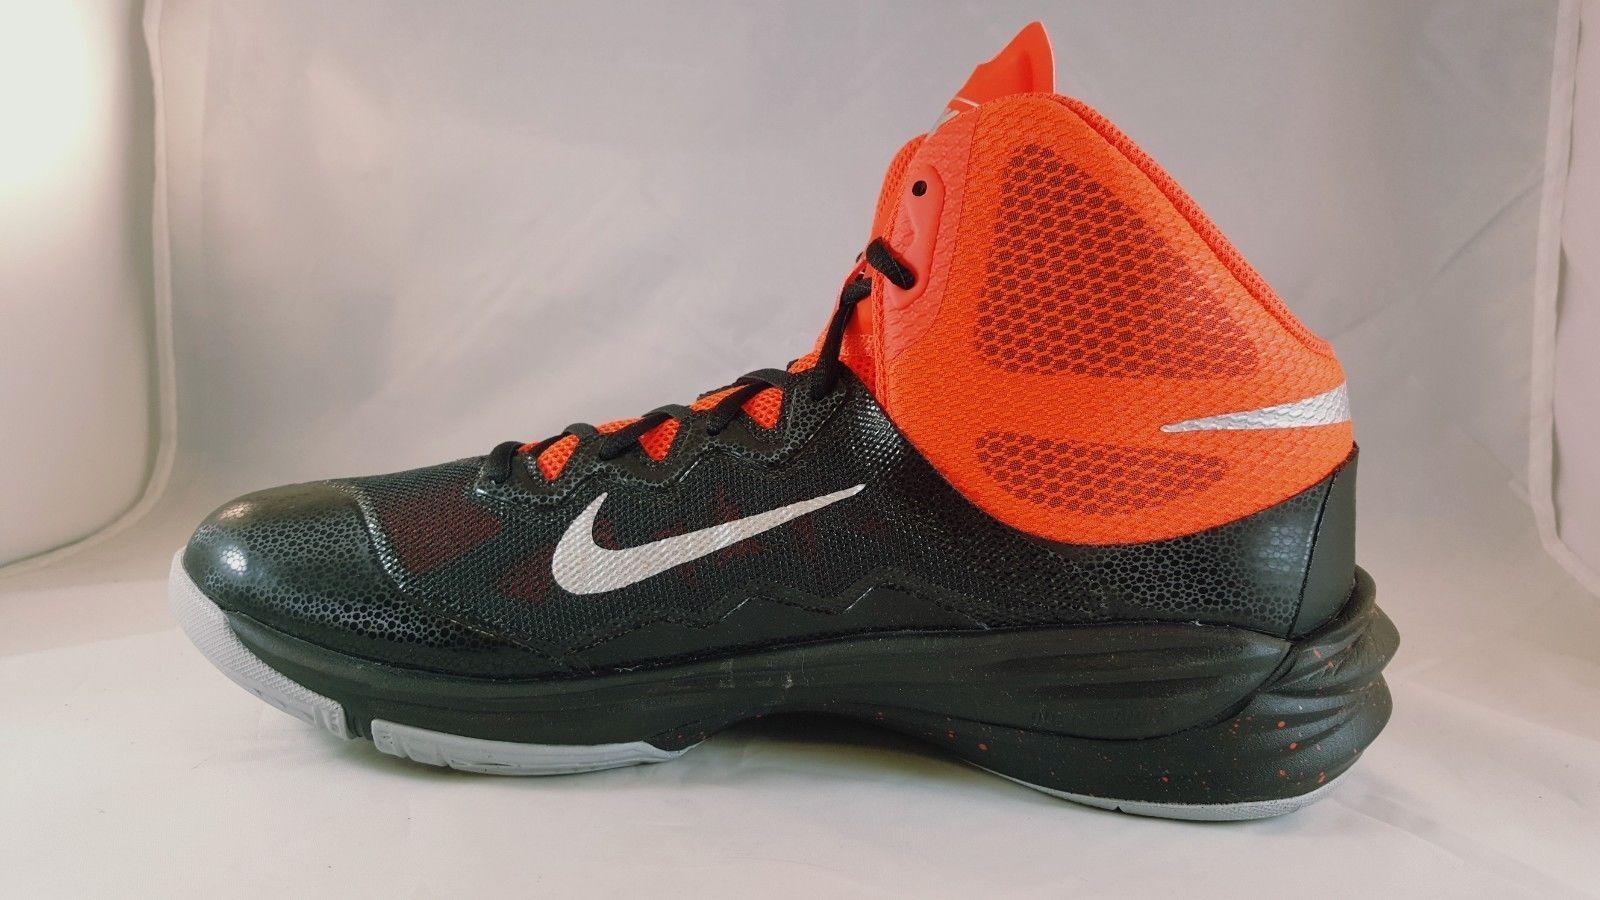 Nike Prime Hype DF II Men's Basketball Shoe 806941 006 Size 14